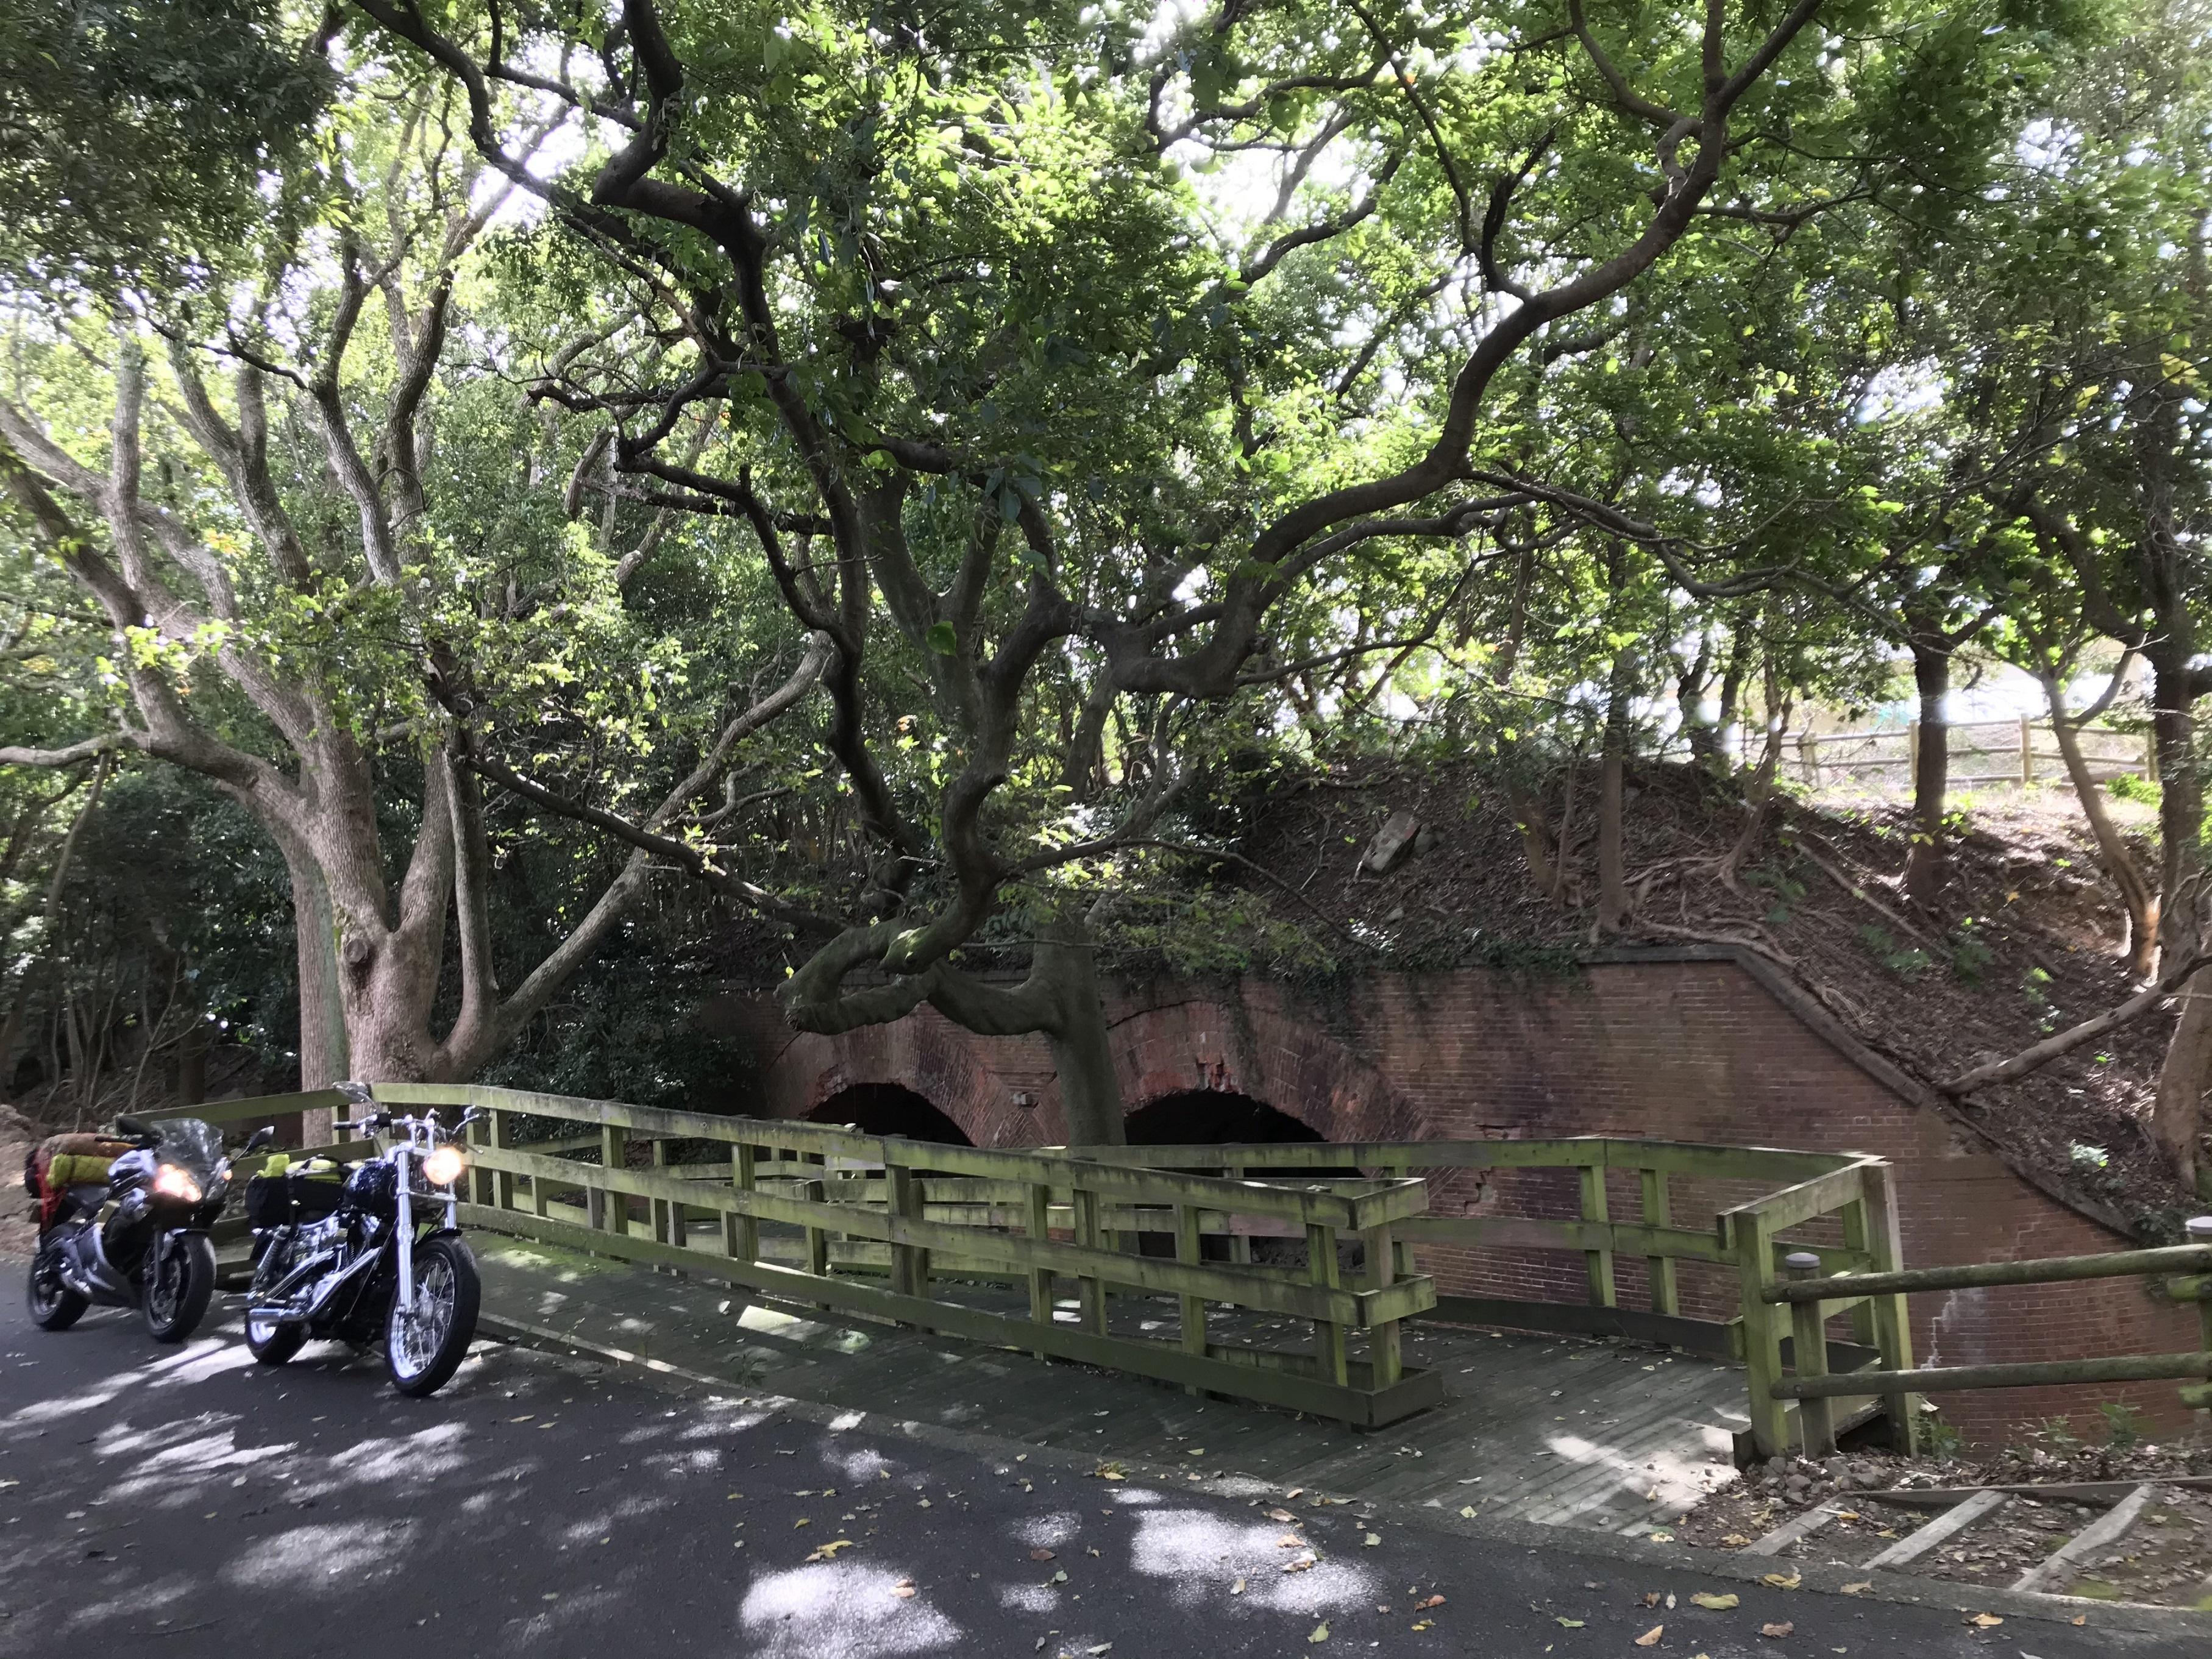 harleydavidson-dyna-capemuroto-motorcycle-touring-awaji-yura-fortress-cannon-2.jpg